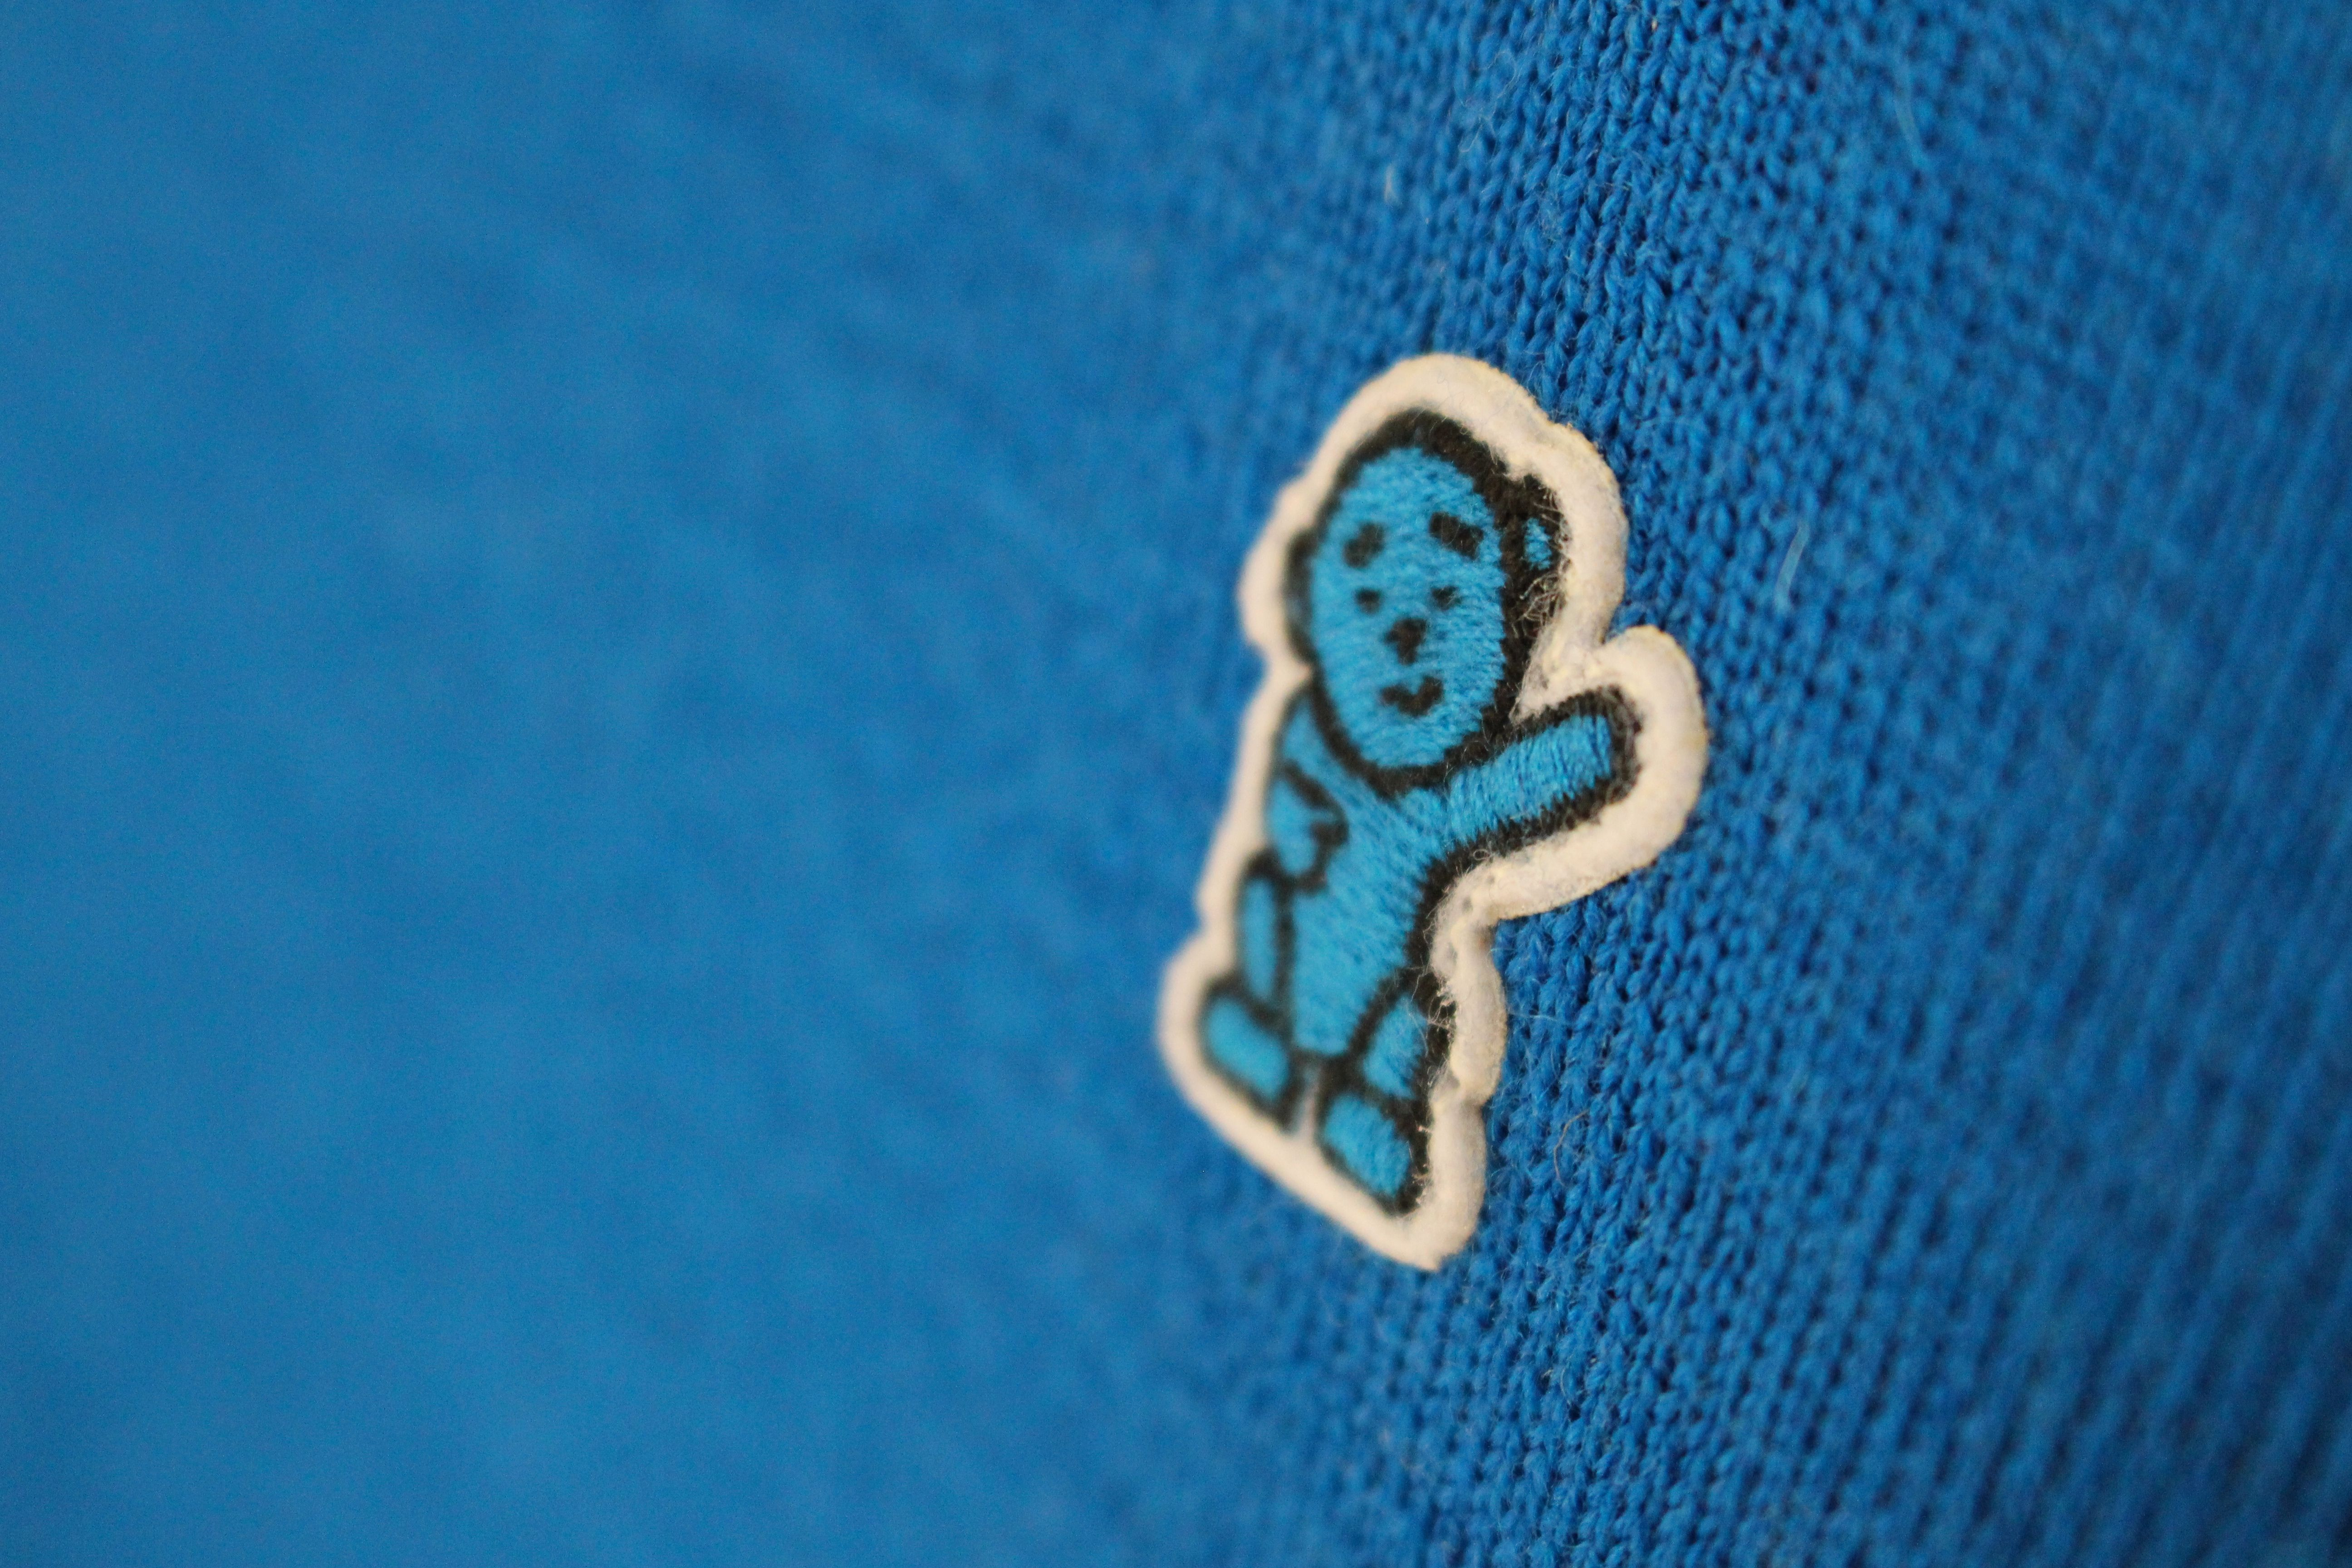 Pulls Montant  #pullsmontant #montant #pulls #vintage #ski #look #fashion #aprèsski #esf #bleu #blue